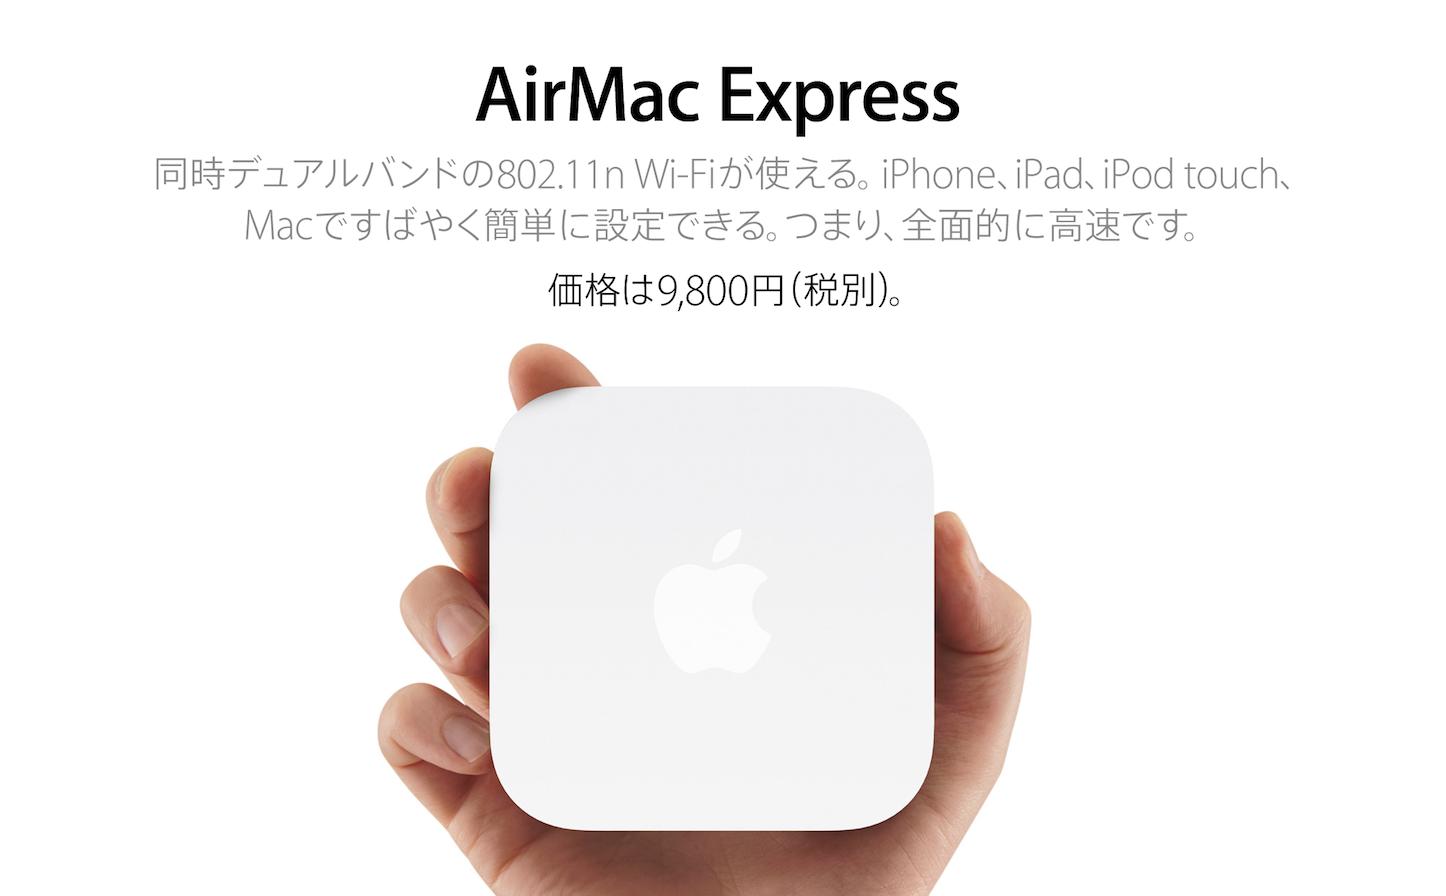 AirMac Express Hero